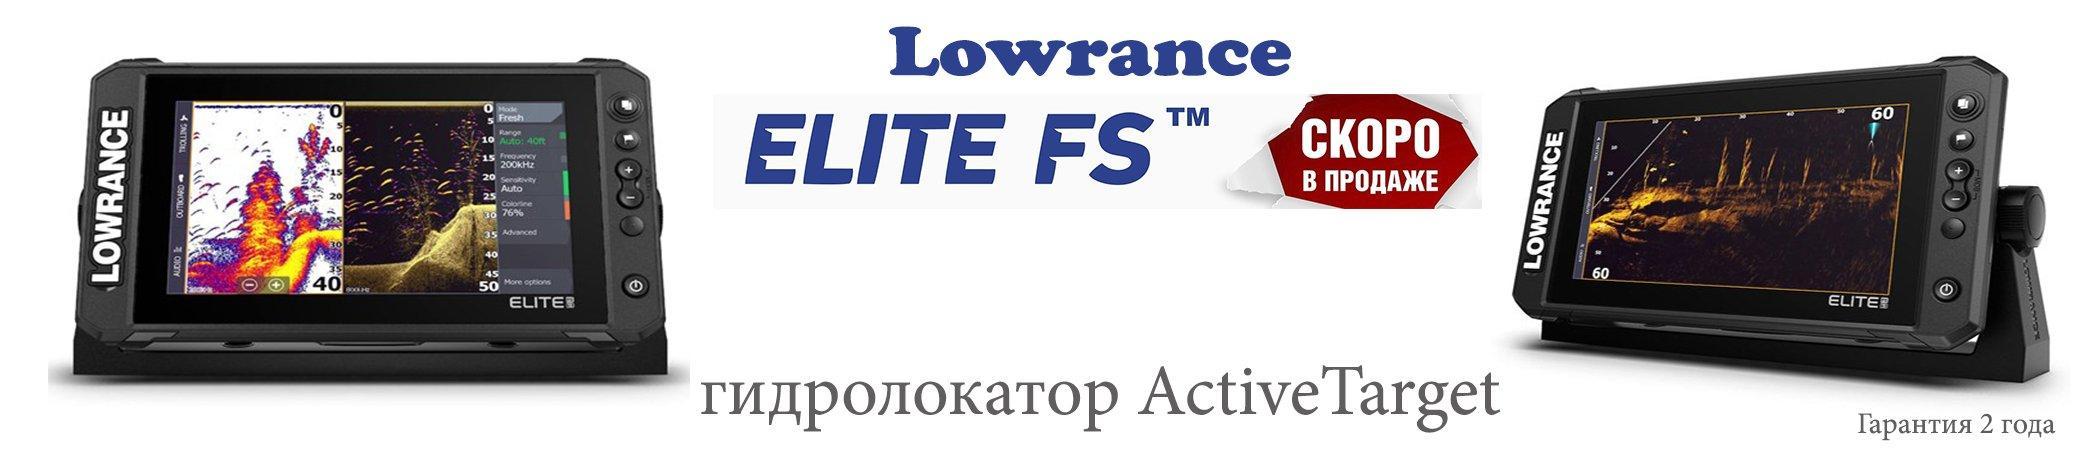 Lowrance Elite FS